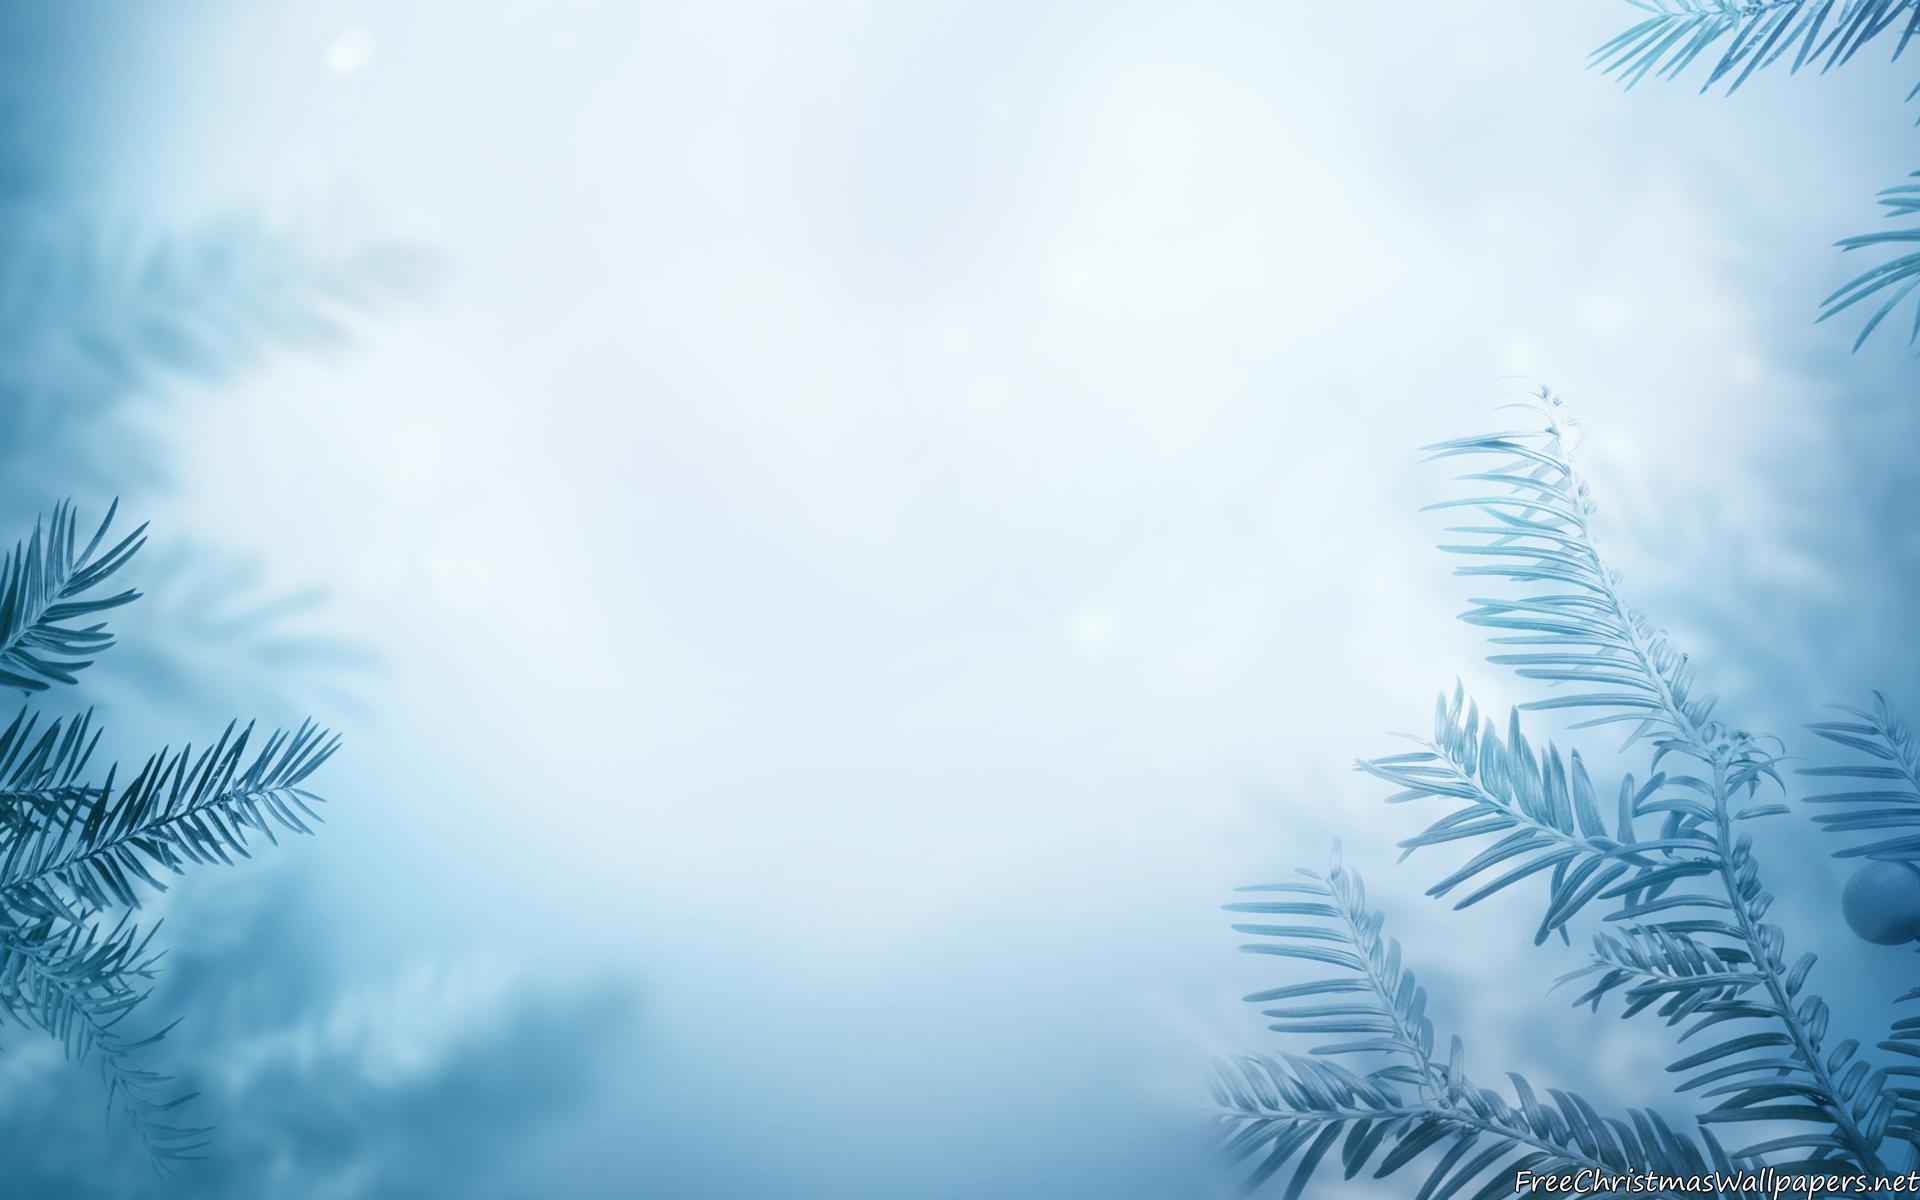 Winter Background wallpaper | 1920x1200 | #81016